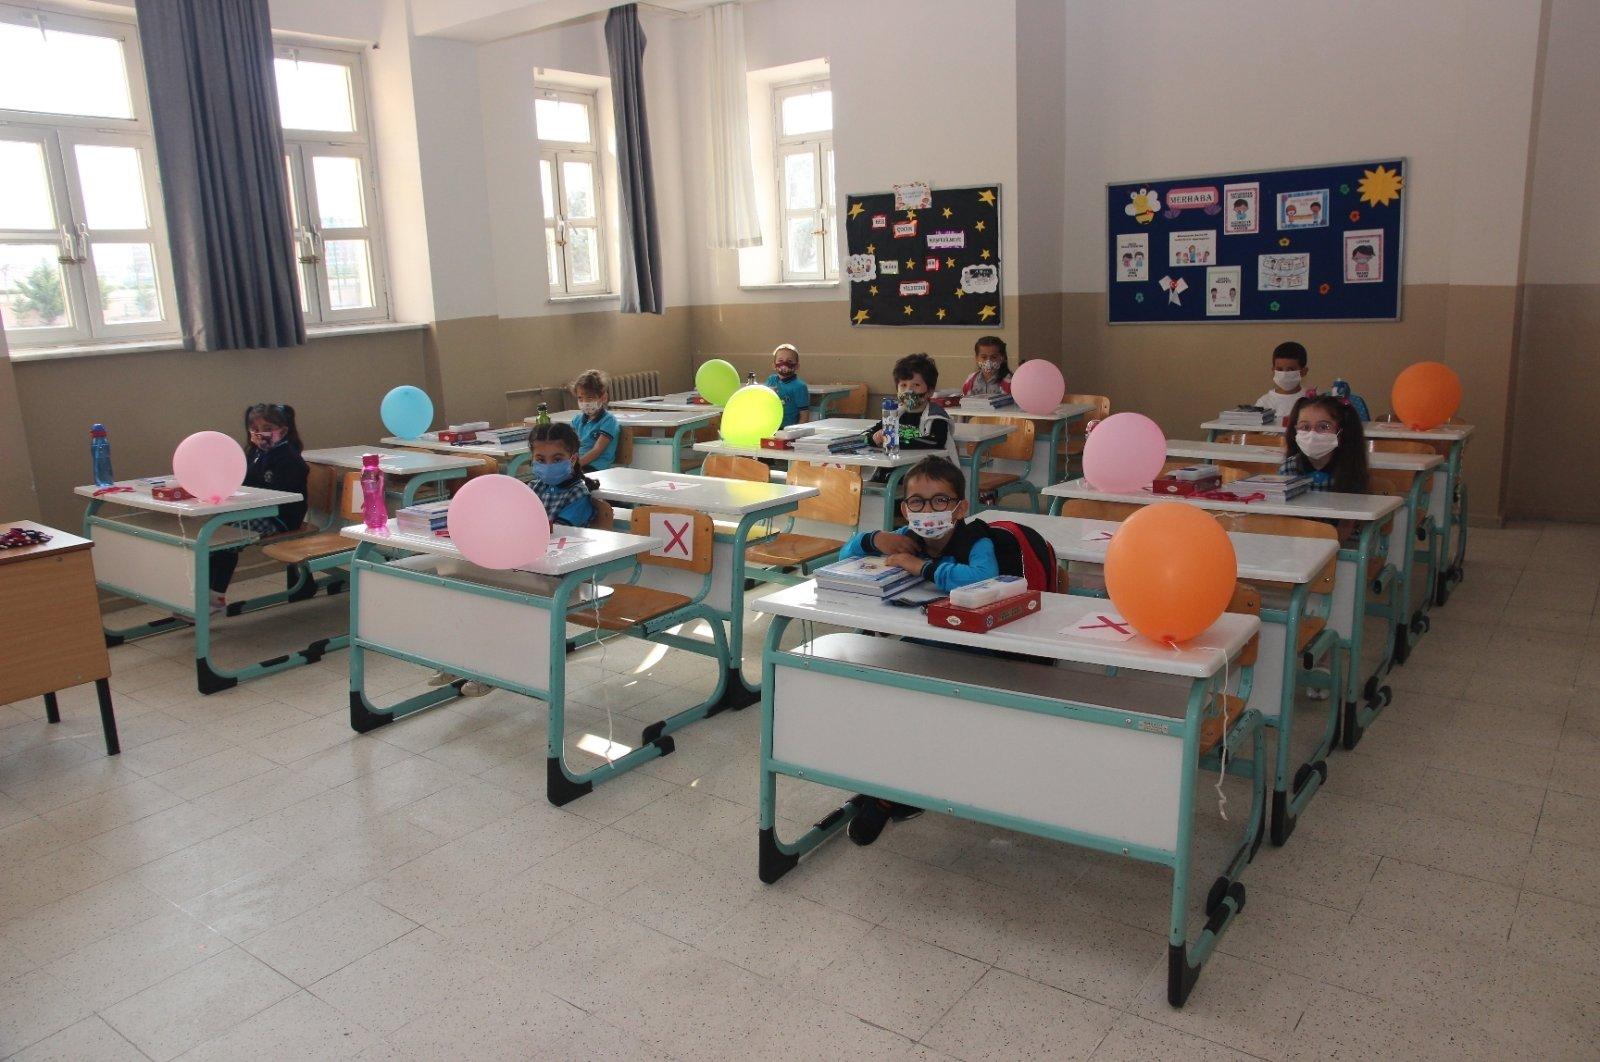 Children wearing protective masks sit inside a classroom, in Bursa, northwestern Turkey, Sept. 21, 2020. (DHA Photo)